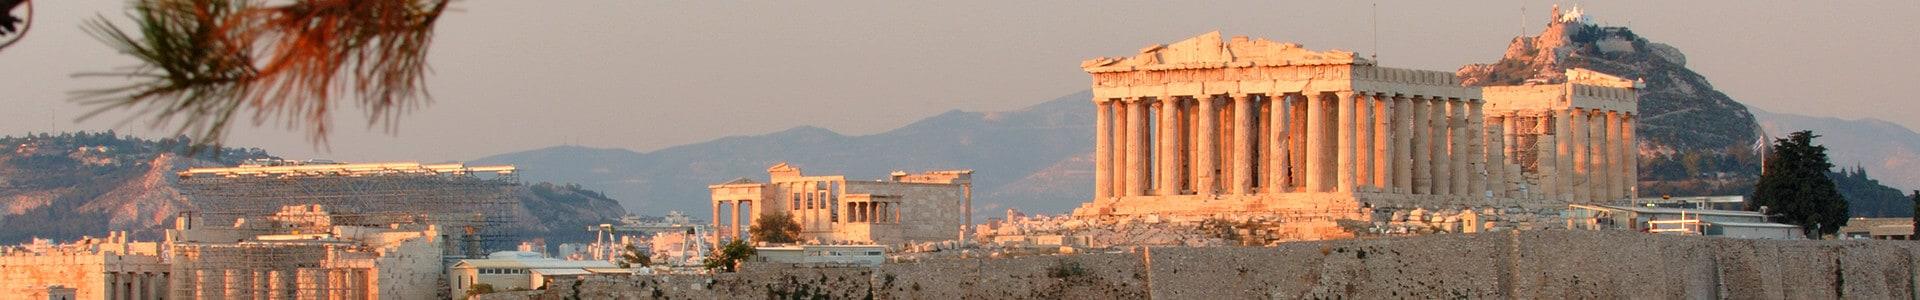 Voyage Grèce continentale - TUI